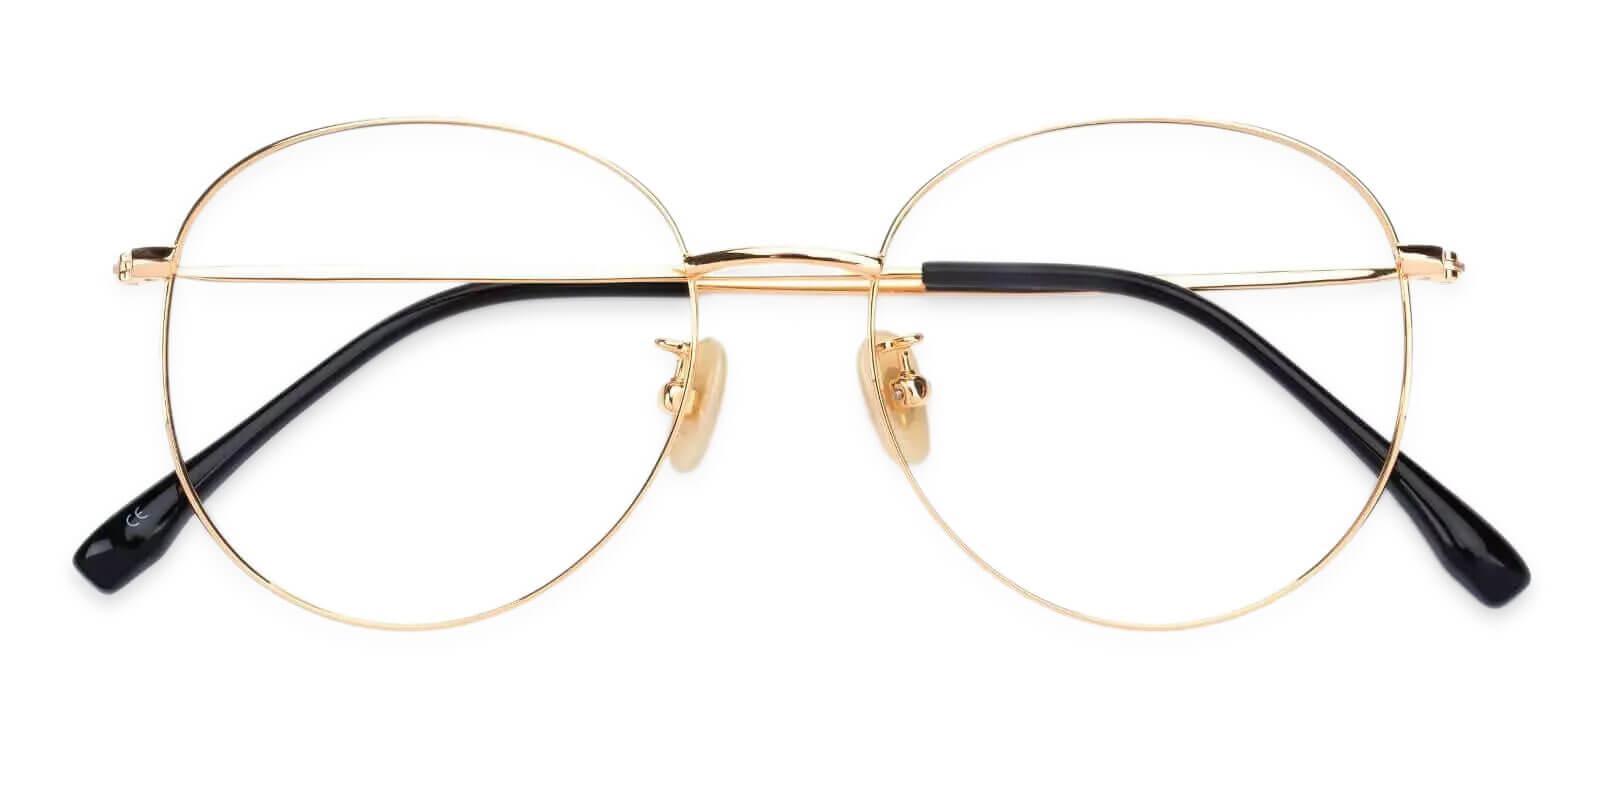 Mongolia Gold Titanium Lightweight , NosePads , Eyeglasses Frames from ABBE Glasses